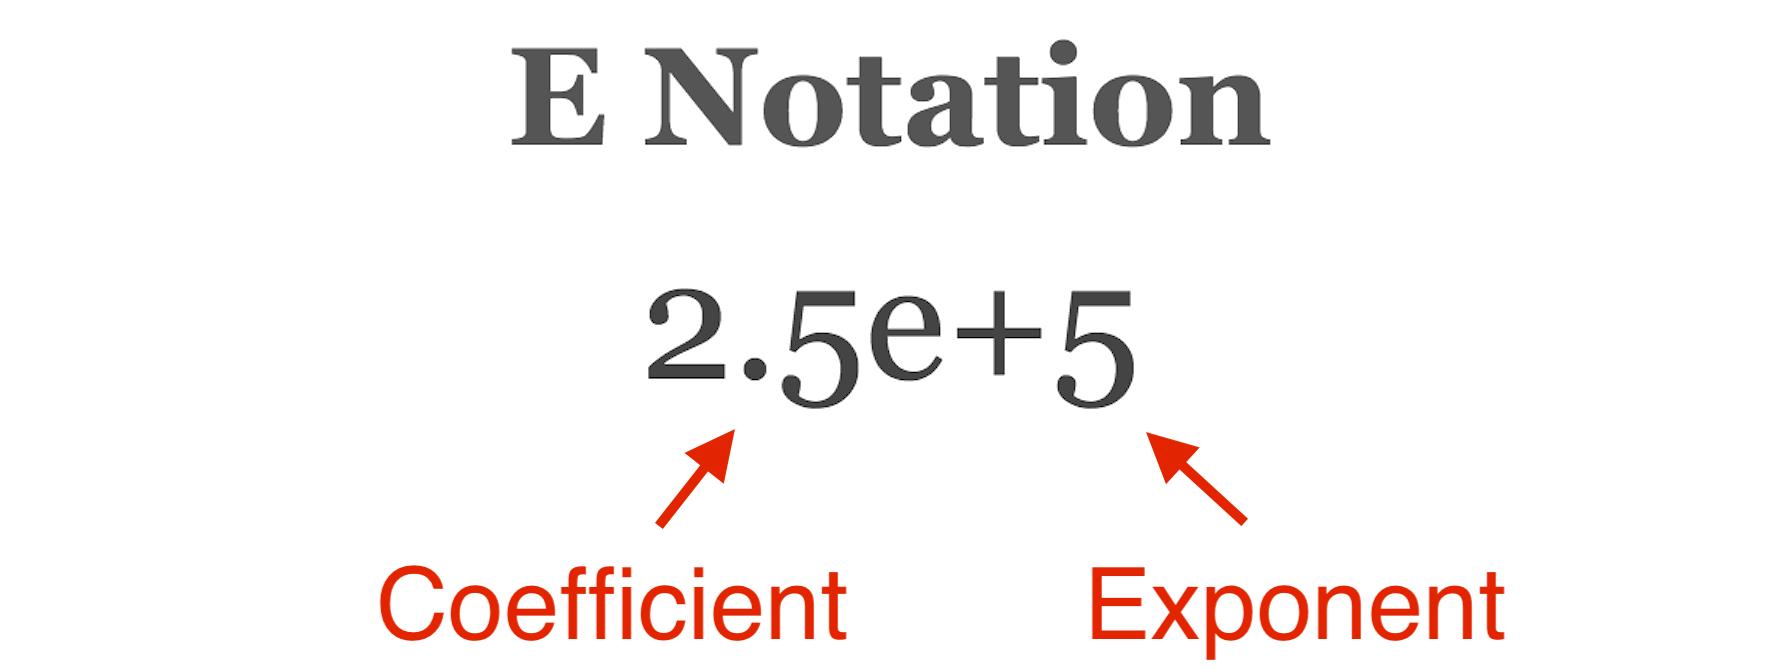 scientific E notation formula